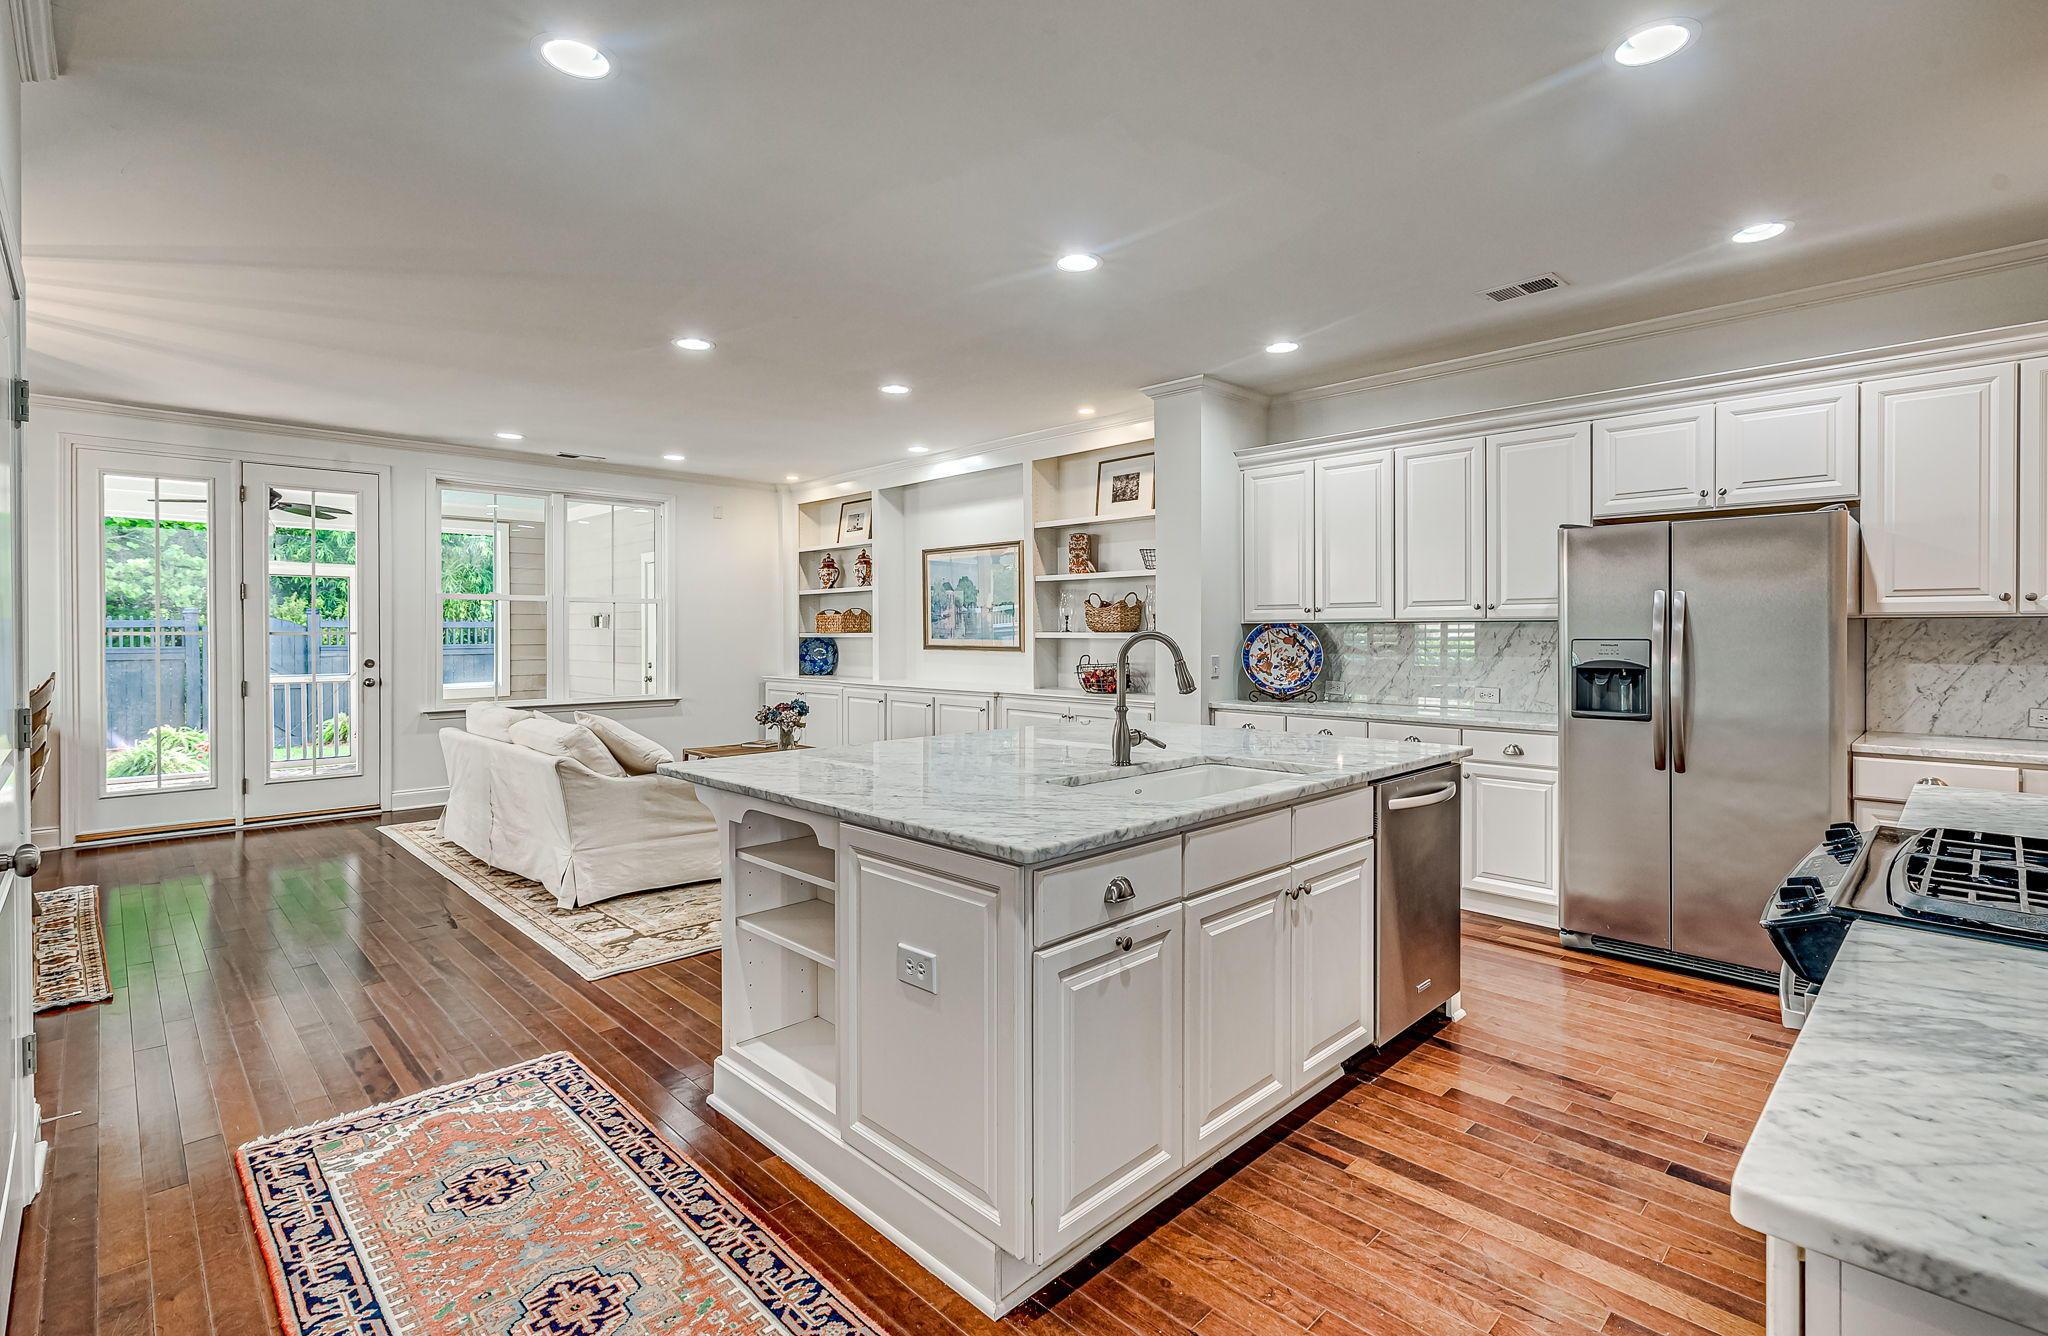 Dunes West Homes For Sale - 2476 Kings Gate, Mount Pleasant, SC - 50